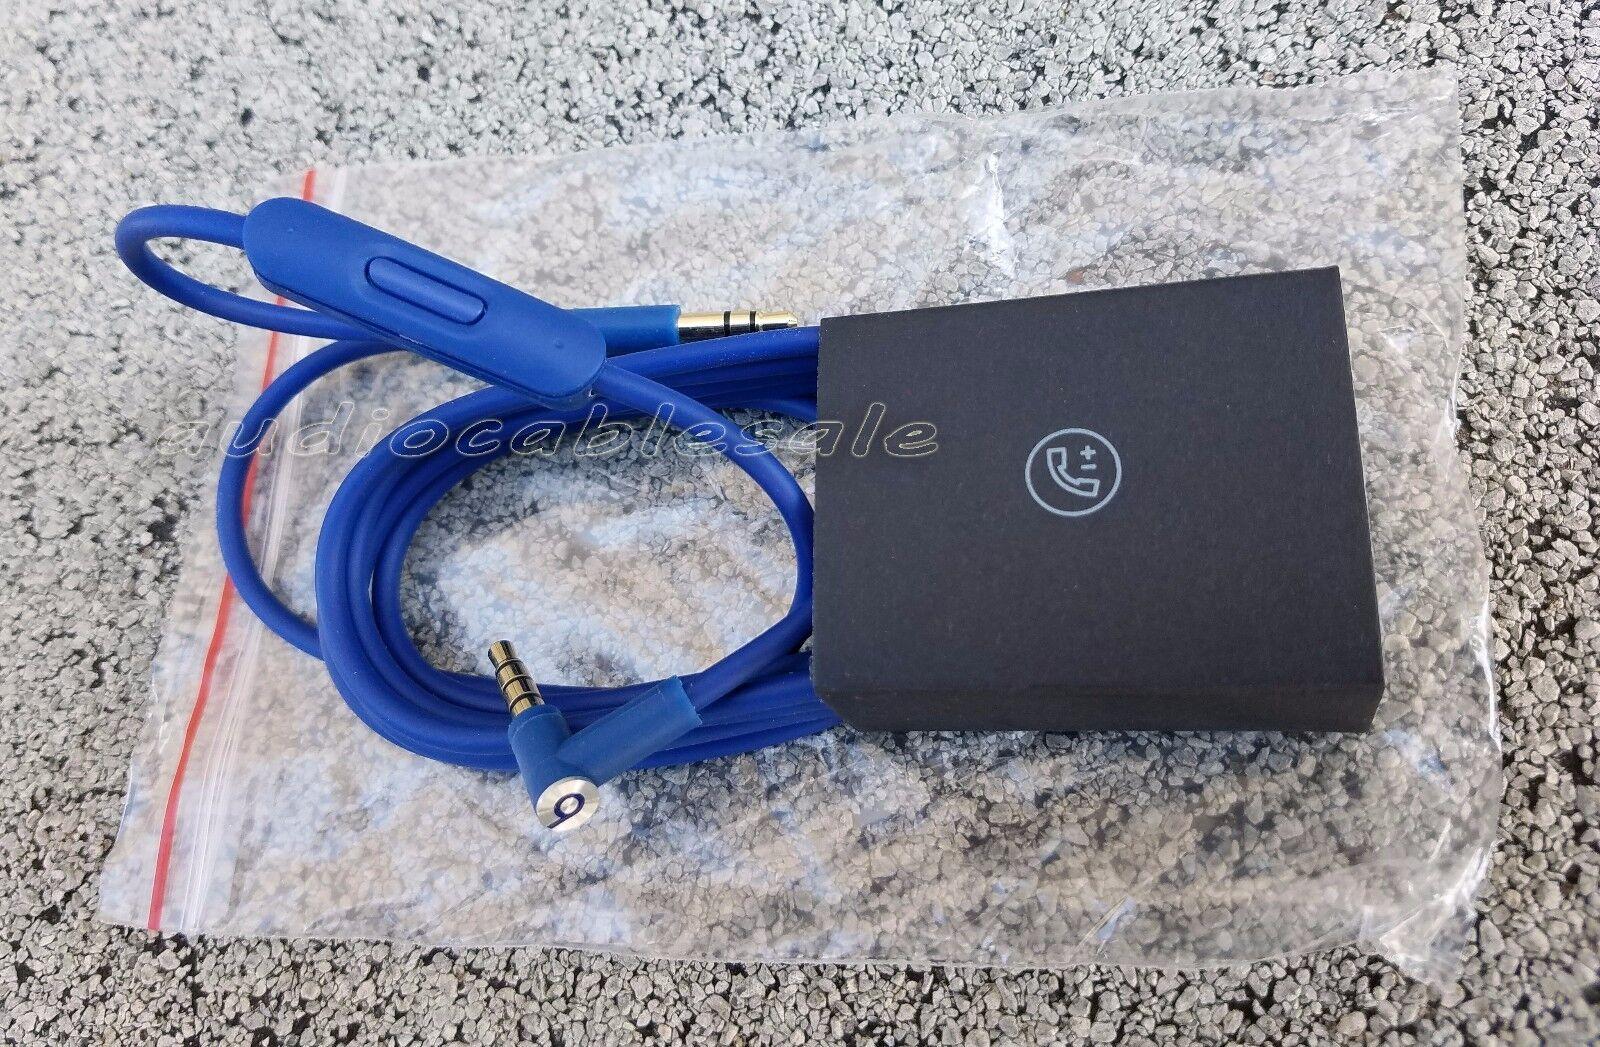 Audio Cable 3.5mm/ L Cord/ for Beats by Dr Dre Headphones Au